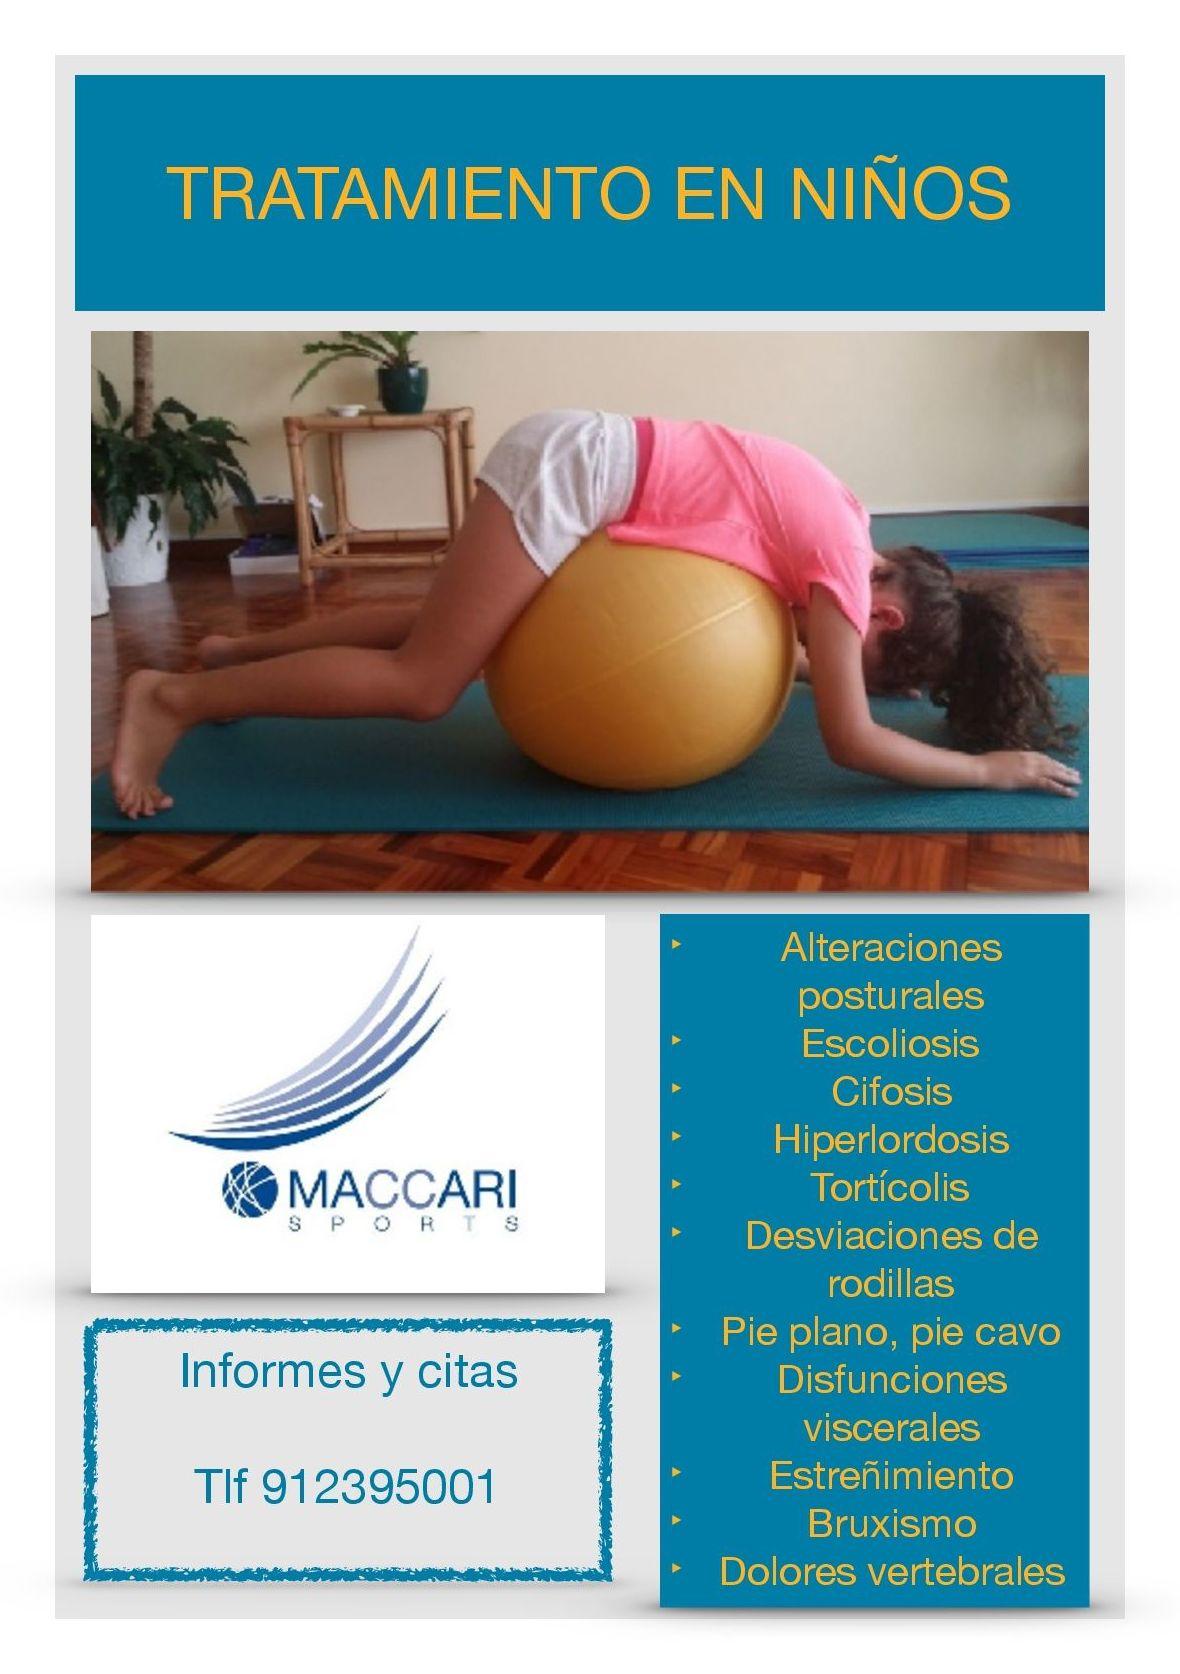 Foto 14 de Fisioterapia en Fuenlabrada | Clínica Fisioterapia Maccari Sport